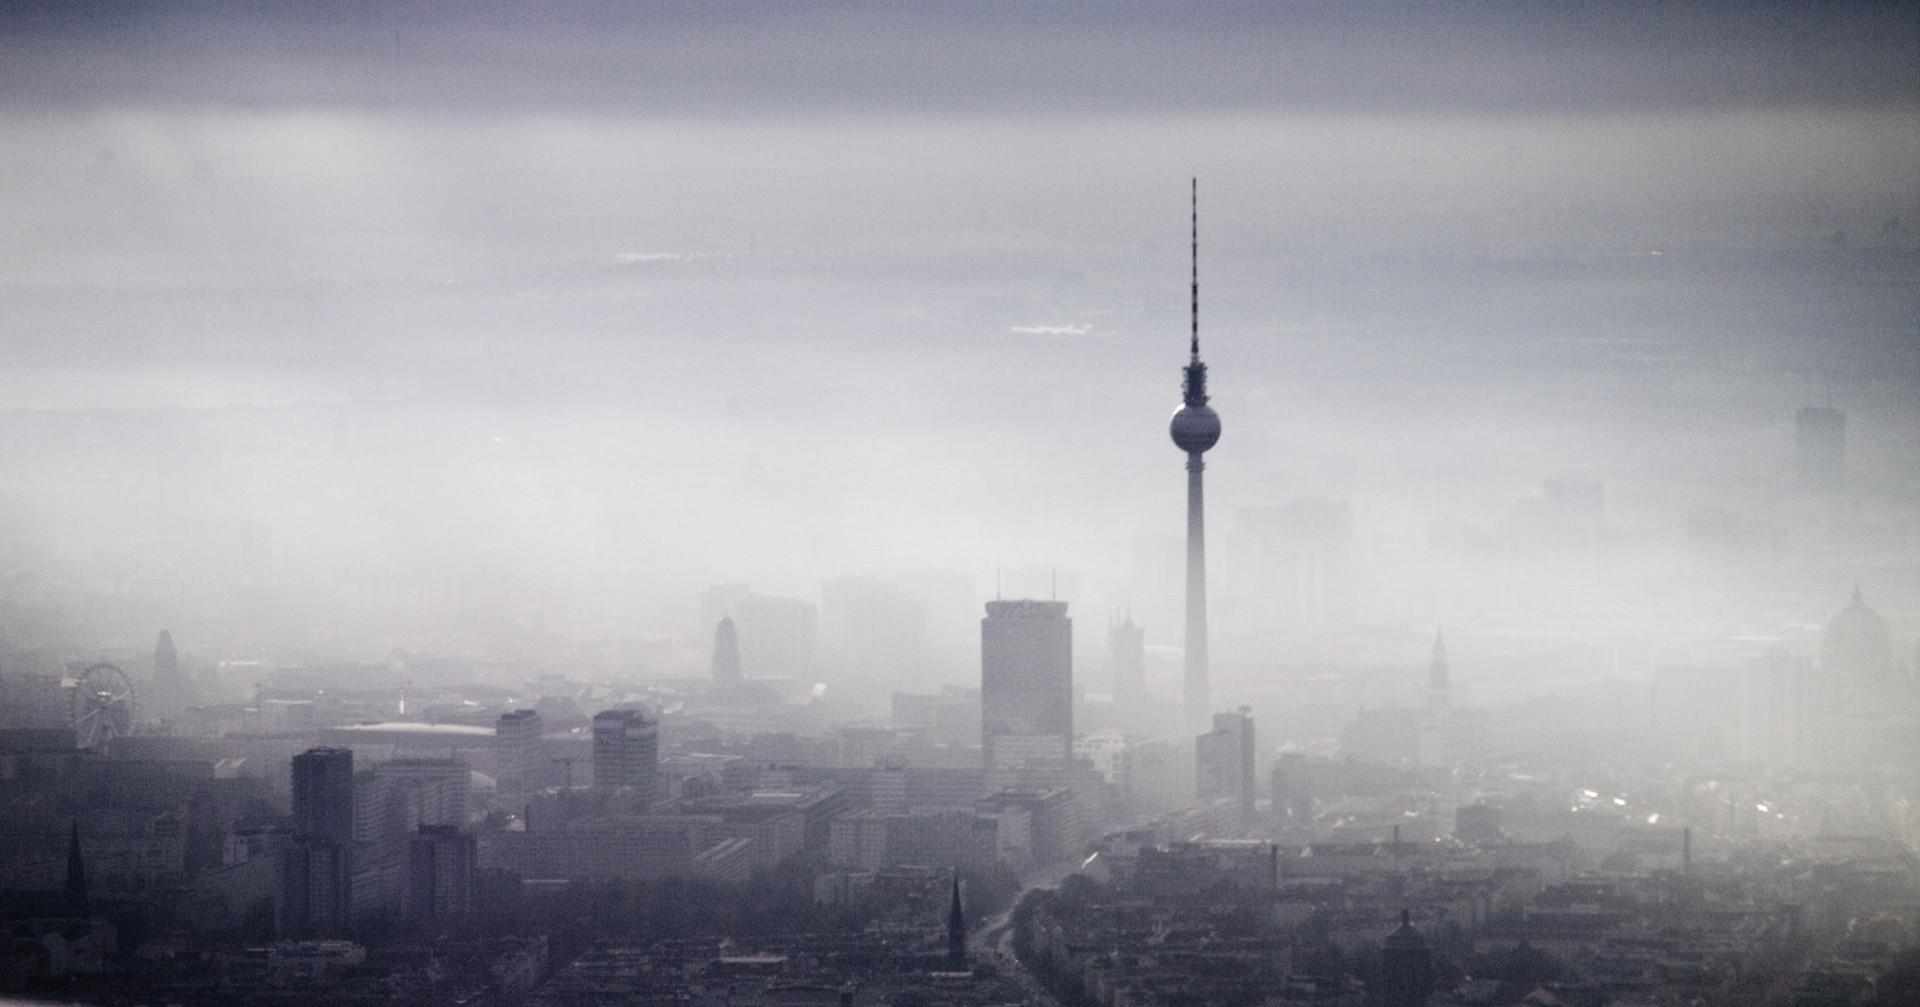 Berlin_Panorama_Carolin-Weinkopf_IGP8300b